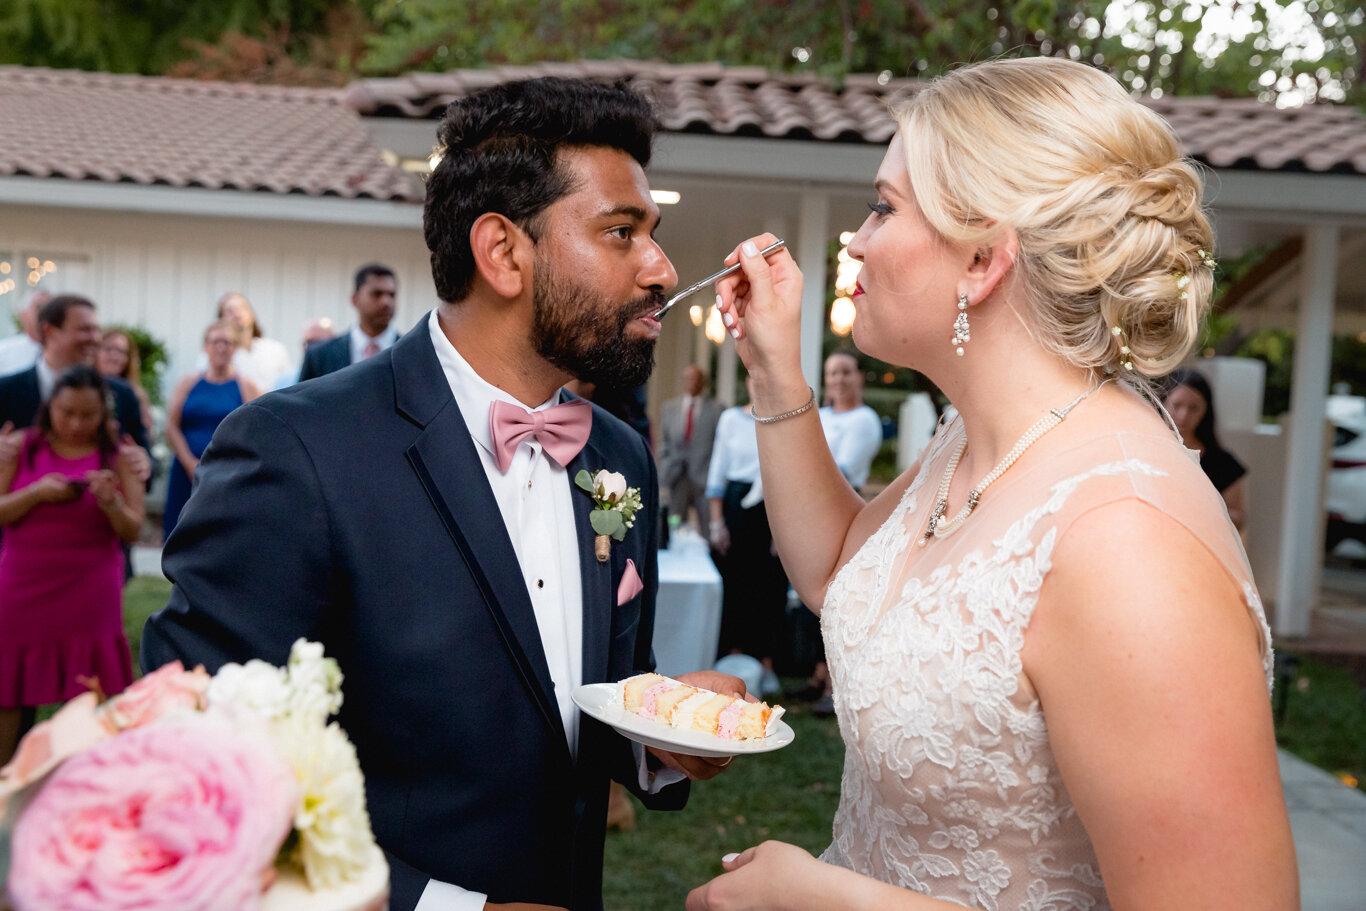 2019.08.24_Emily-Ashir-Wedding-at-the-Maples-6331.jpg